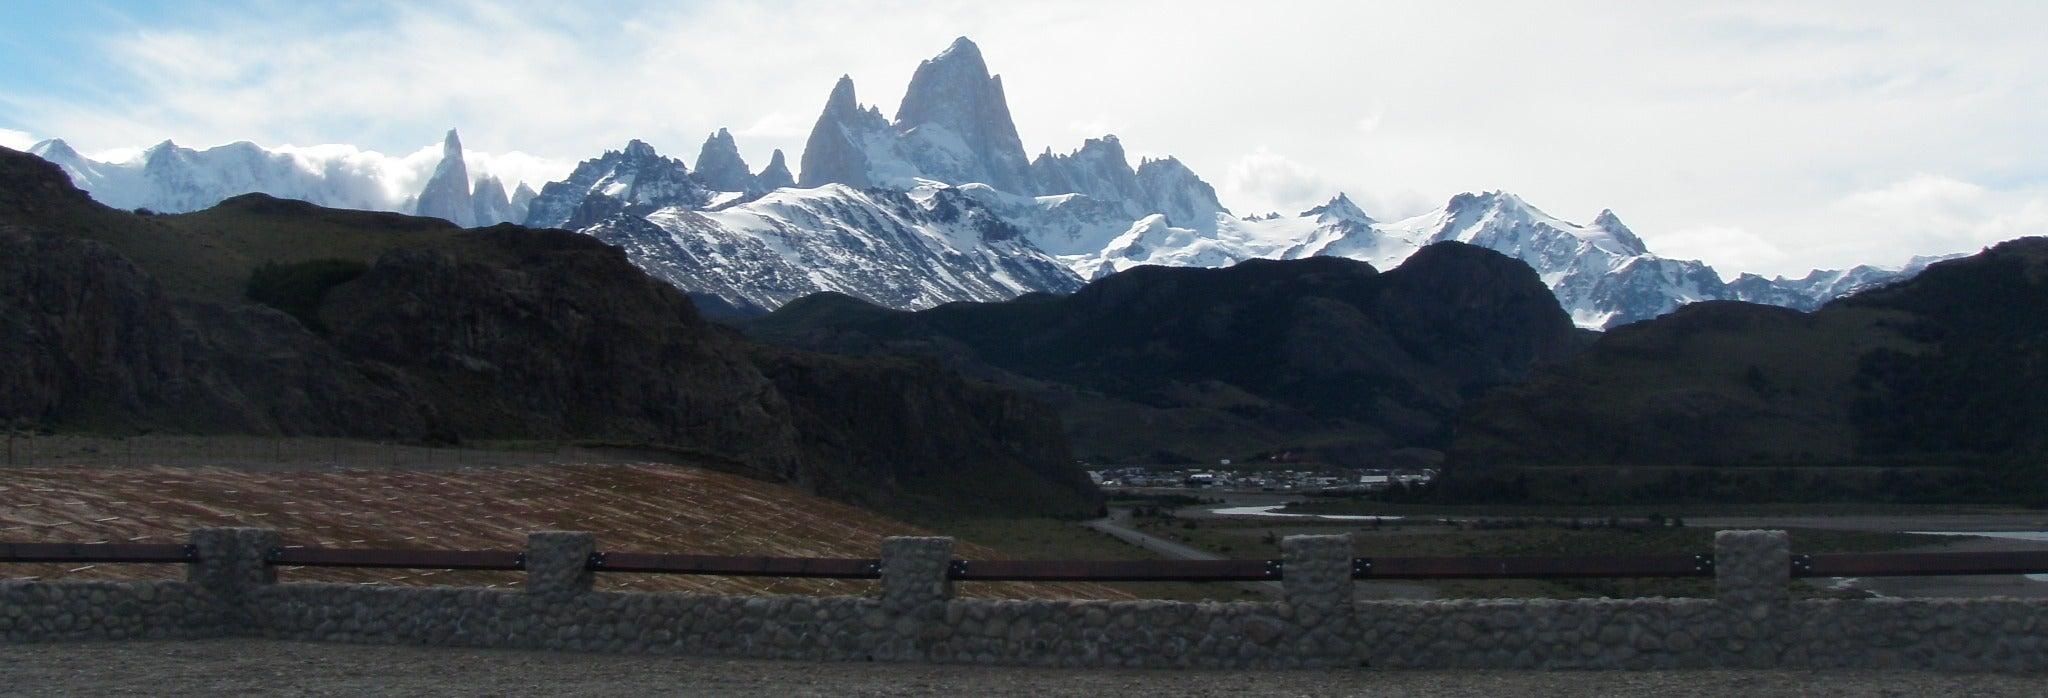 Trekking por El Chaltén